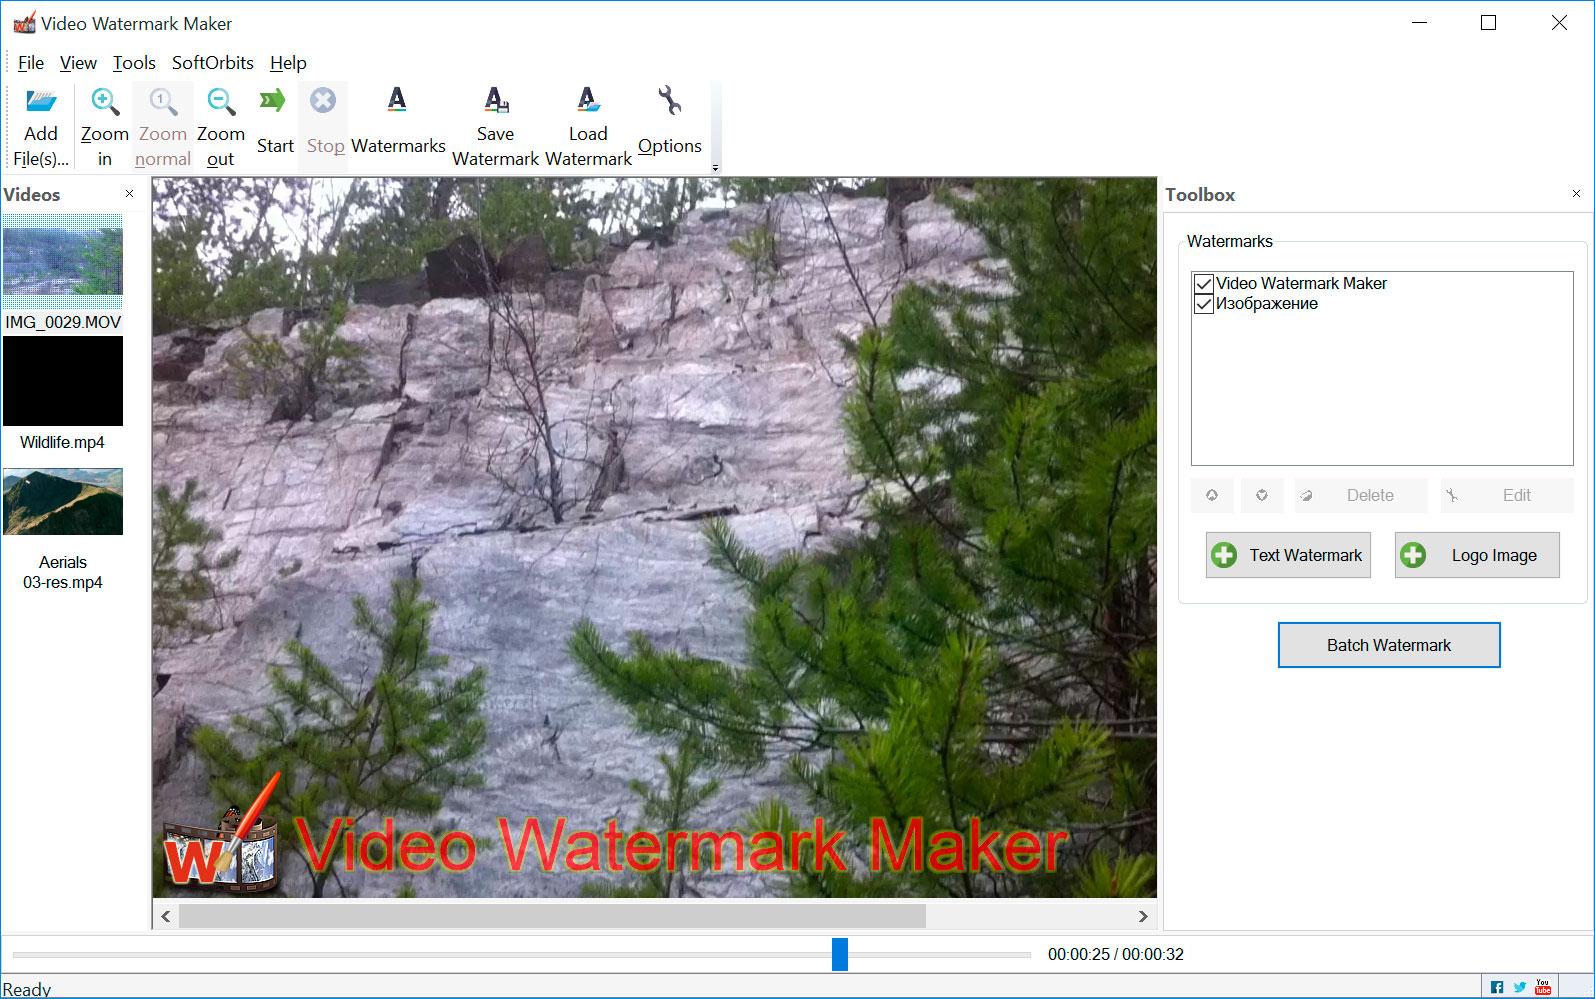 Video Watermark Maker Capturas de tela